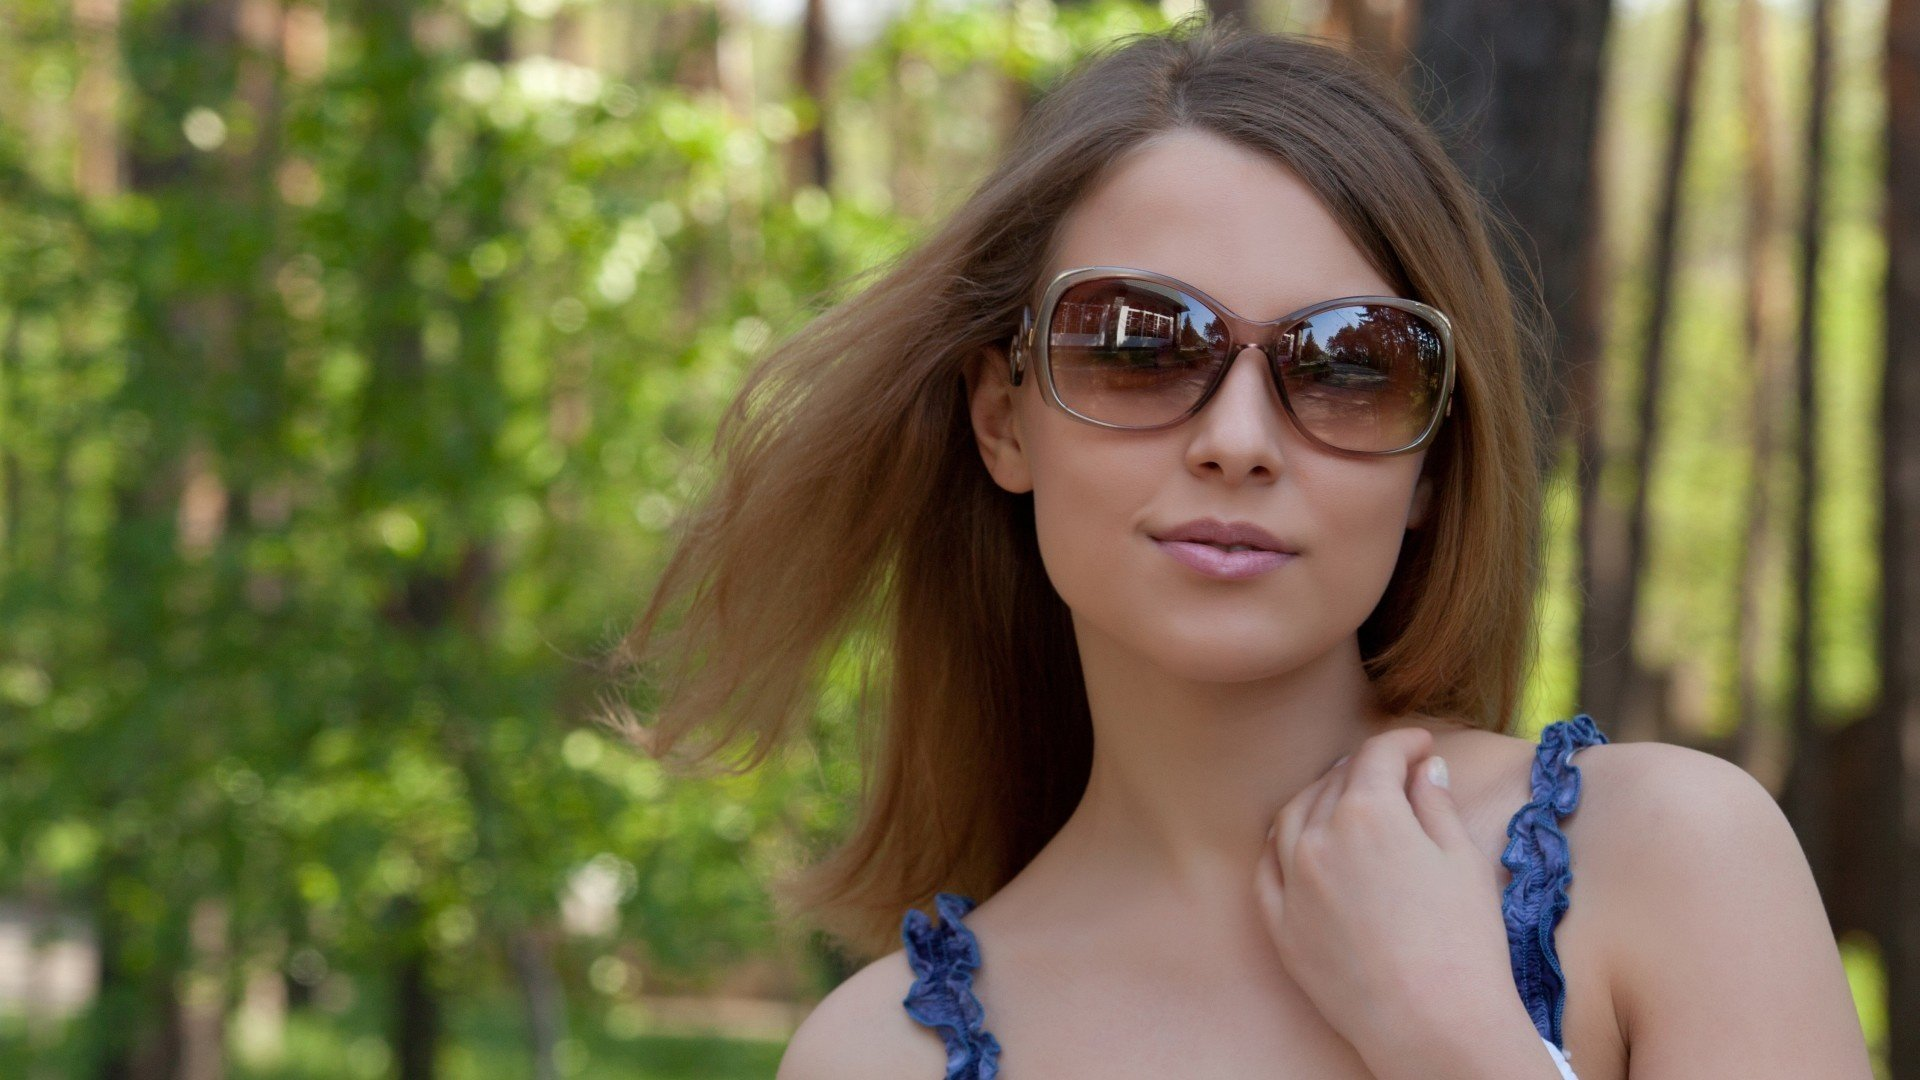 Nikia A Girl Model Summer Sunglasses Face Smile Wallpaper